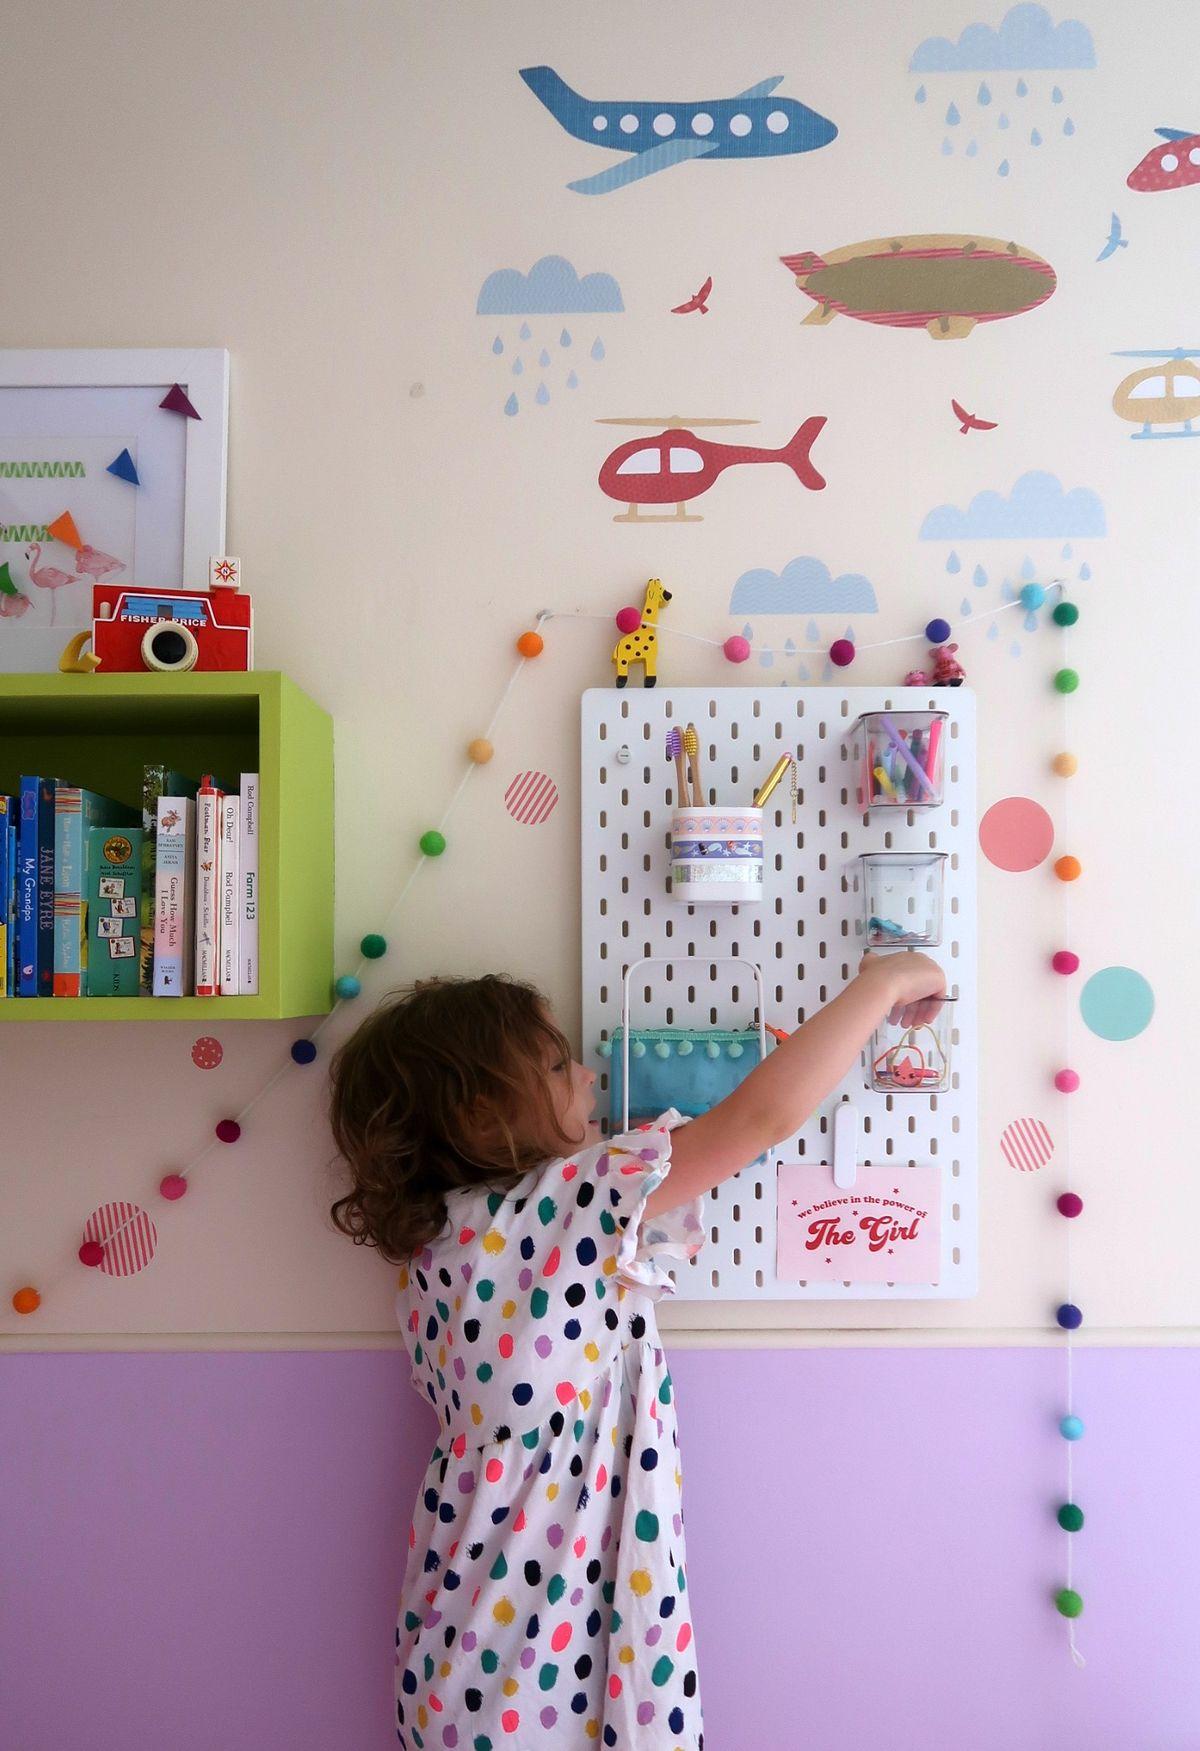 Colourful children's rooms with IKEA HACKS. Starting school: IKEA school run hacks - A Baby on Board blog - IKEA SKADIS pegboard tips